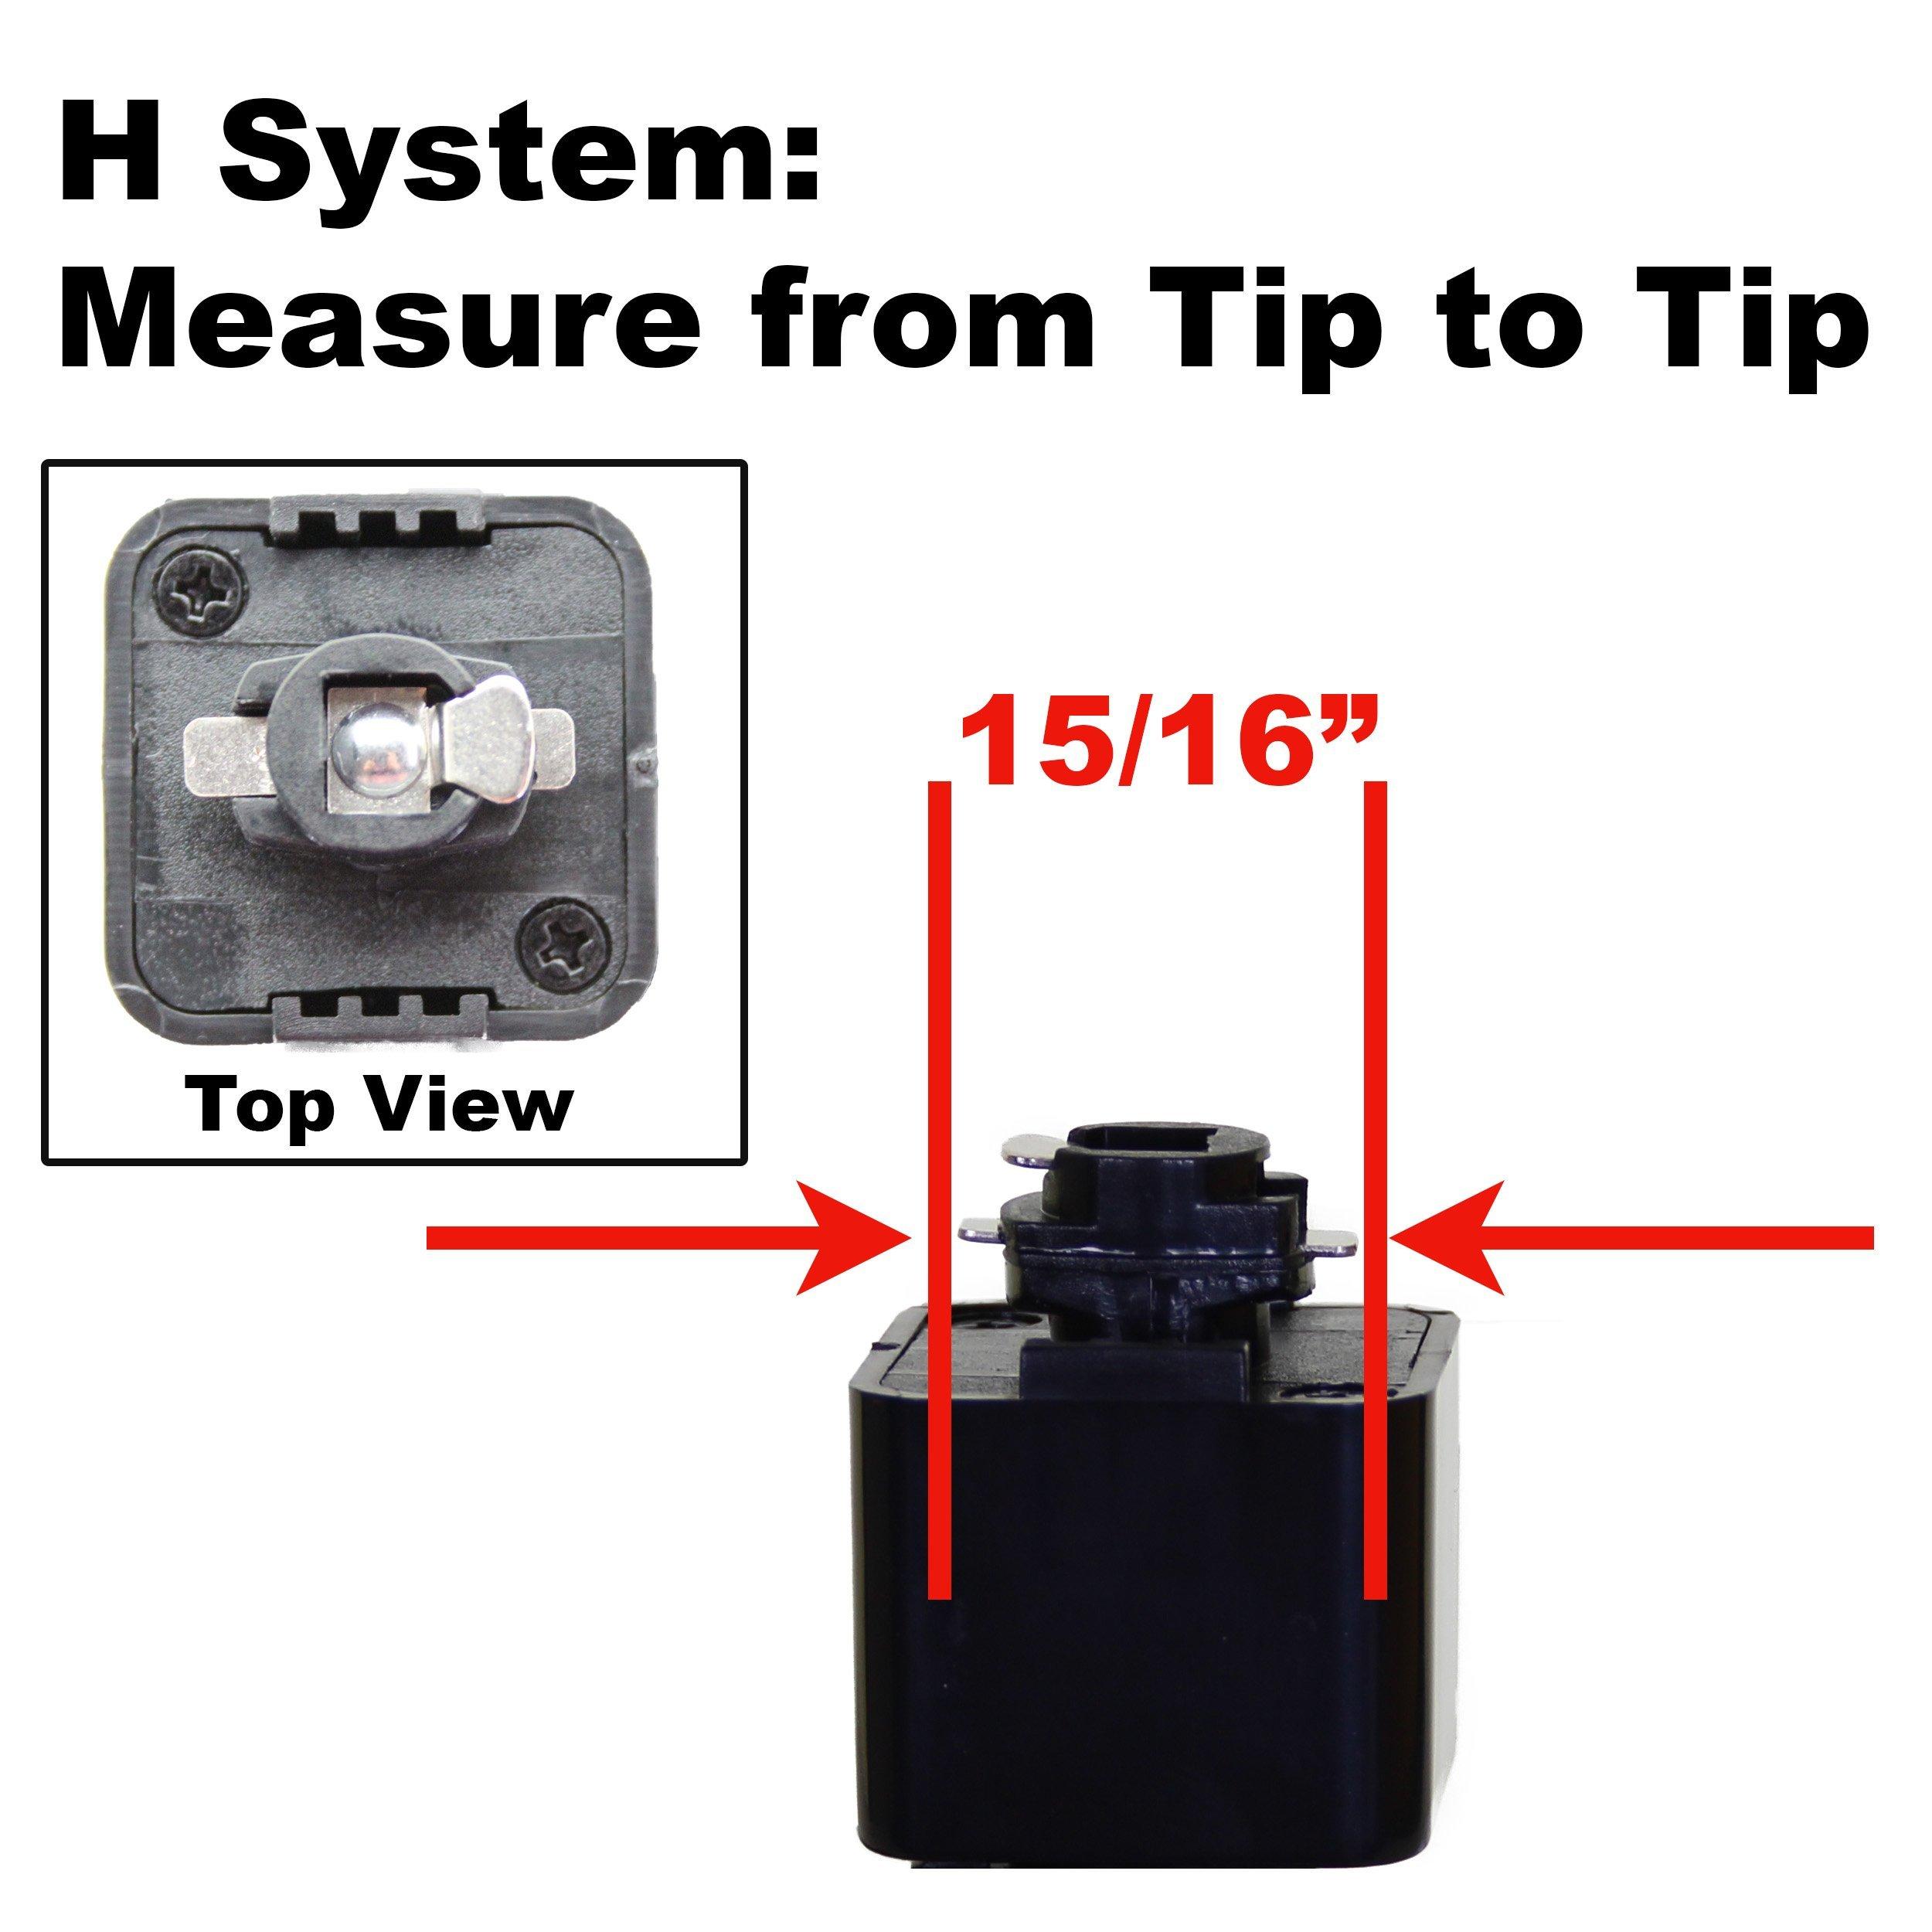 Direct-Lighting Brand H System 3-Lights GU10 LED 7.5W LED (500 lumens Each) Track Lighting Kit Black 3000K Warm White Bulbs Included HT-50154L-330K (Black) (Renewed)